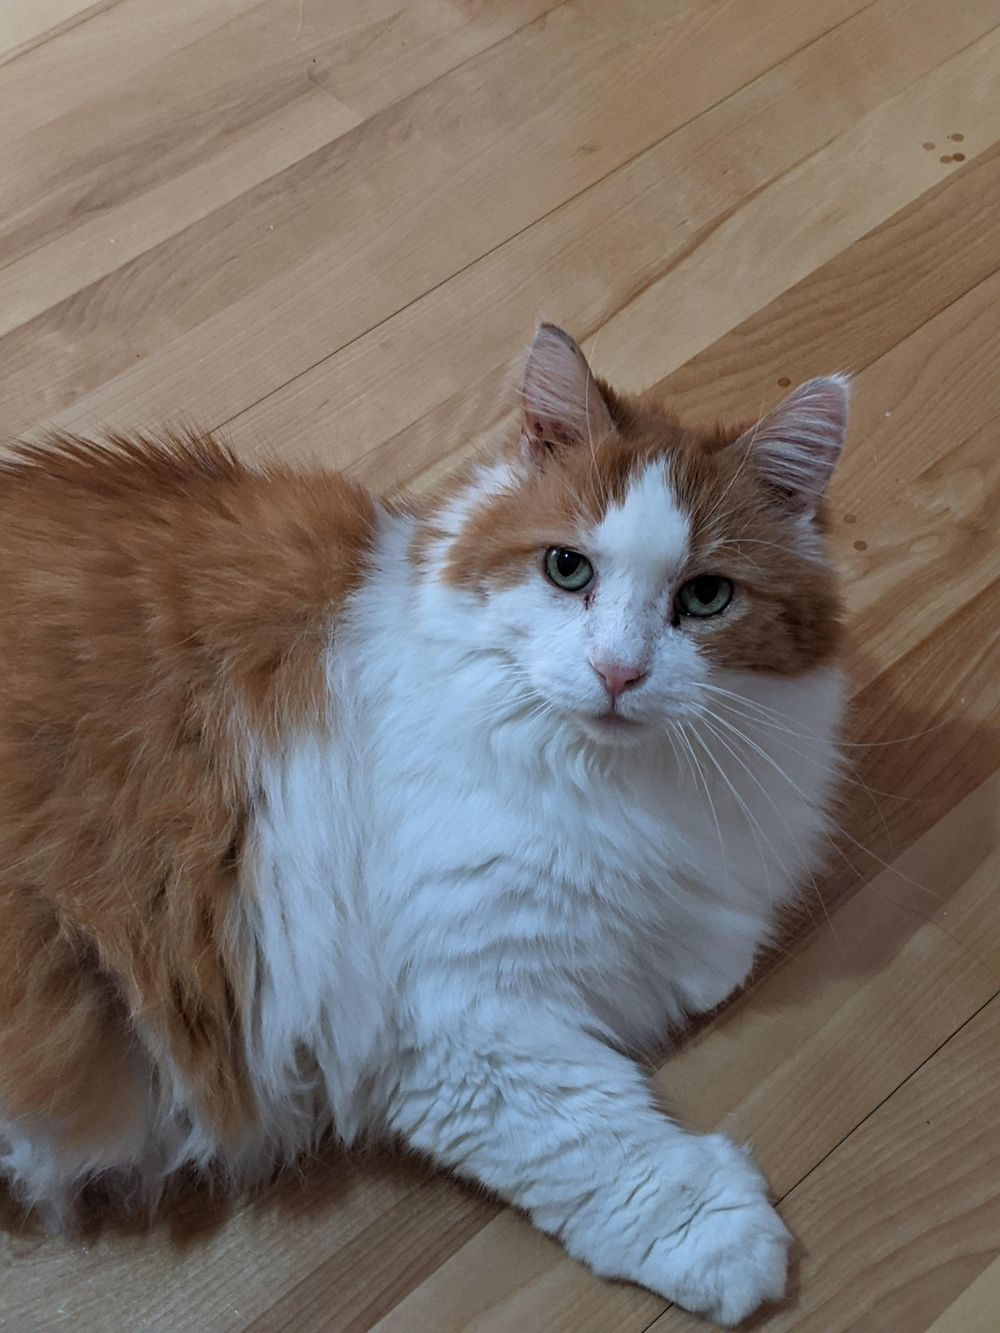 My cat Viktor - image 2 - student project